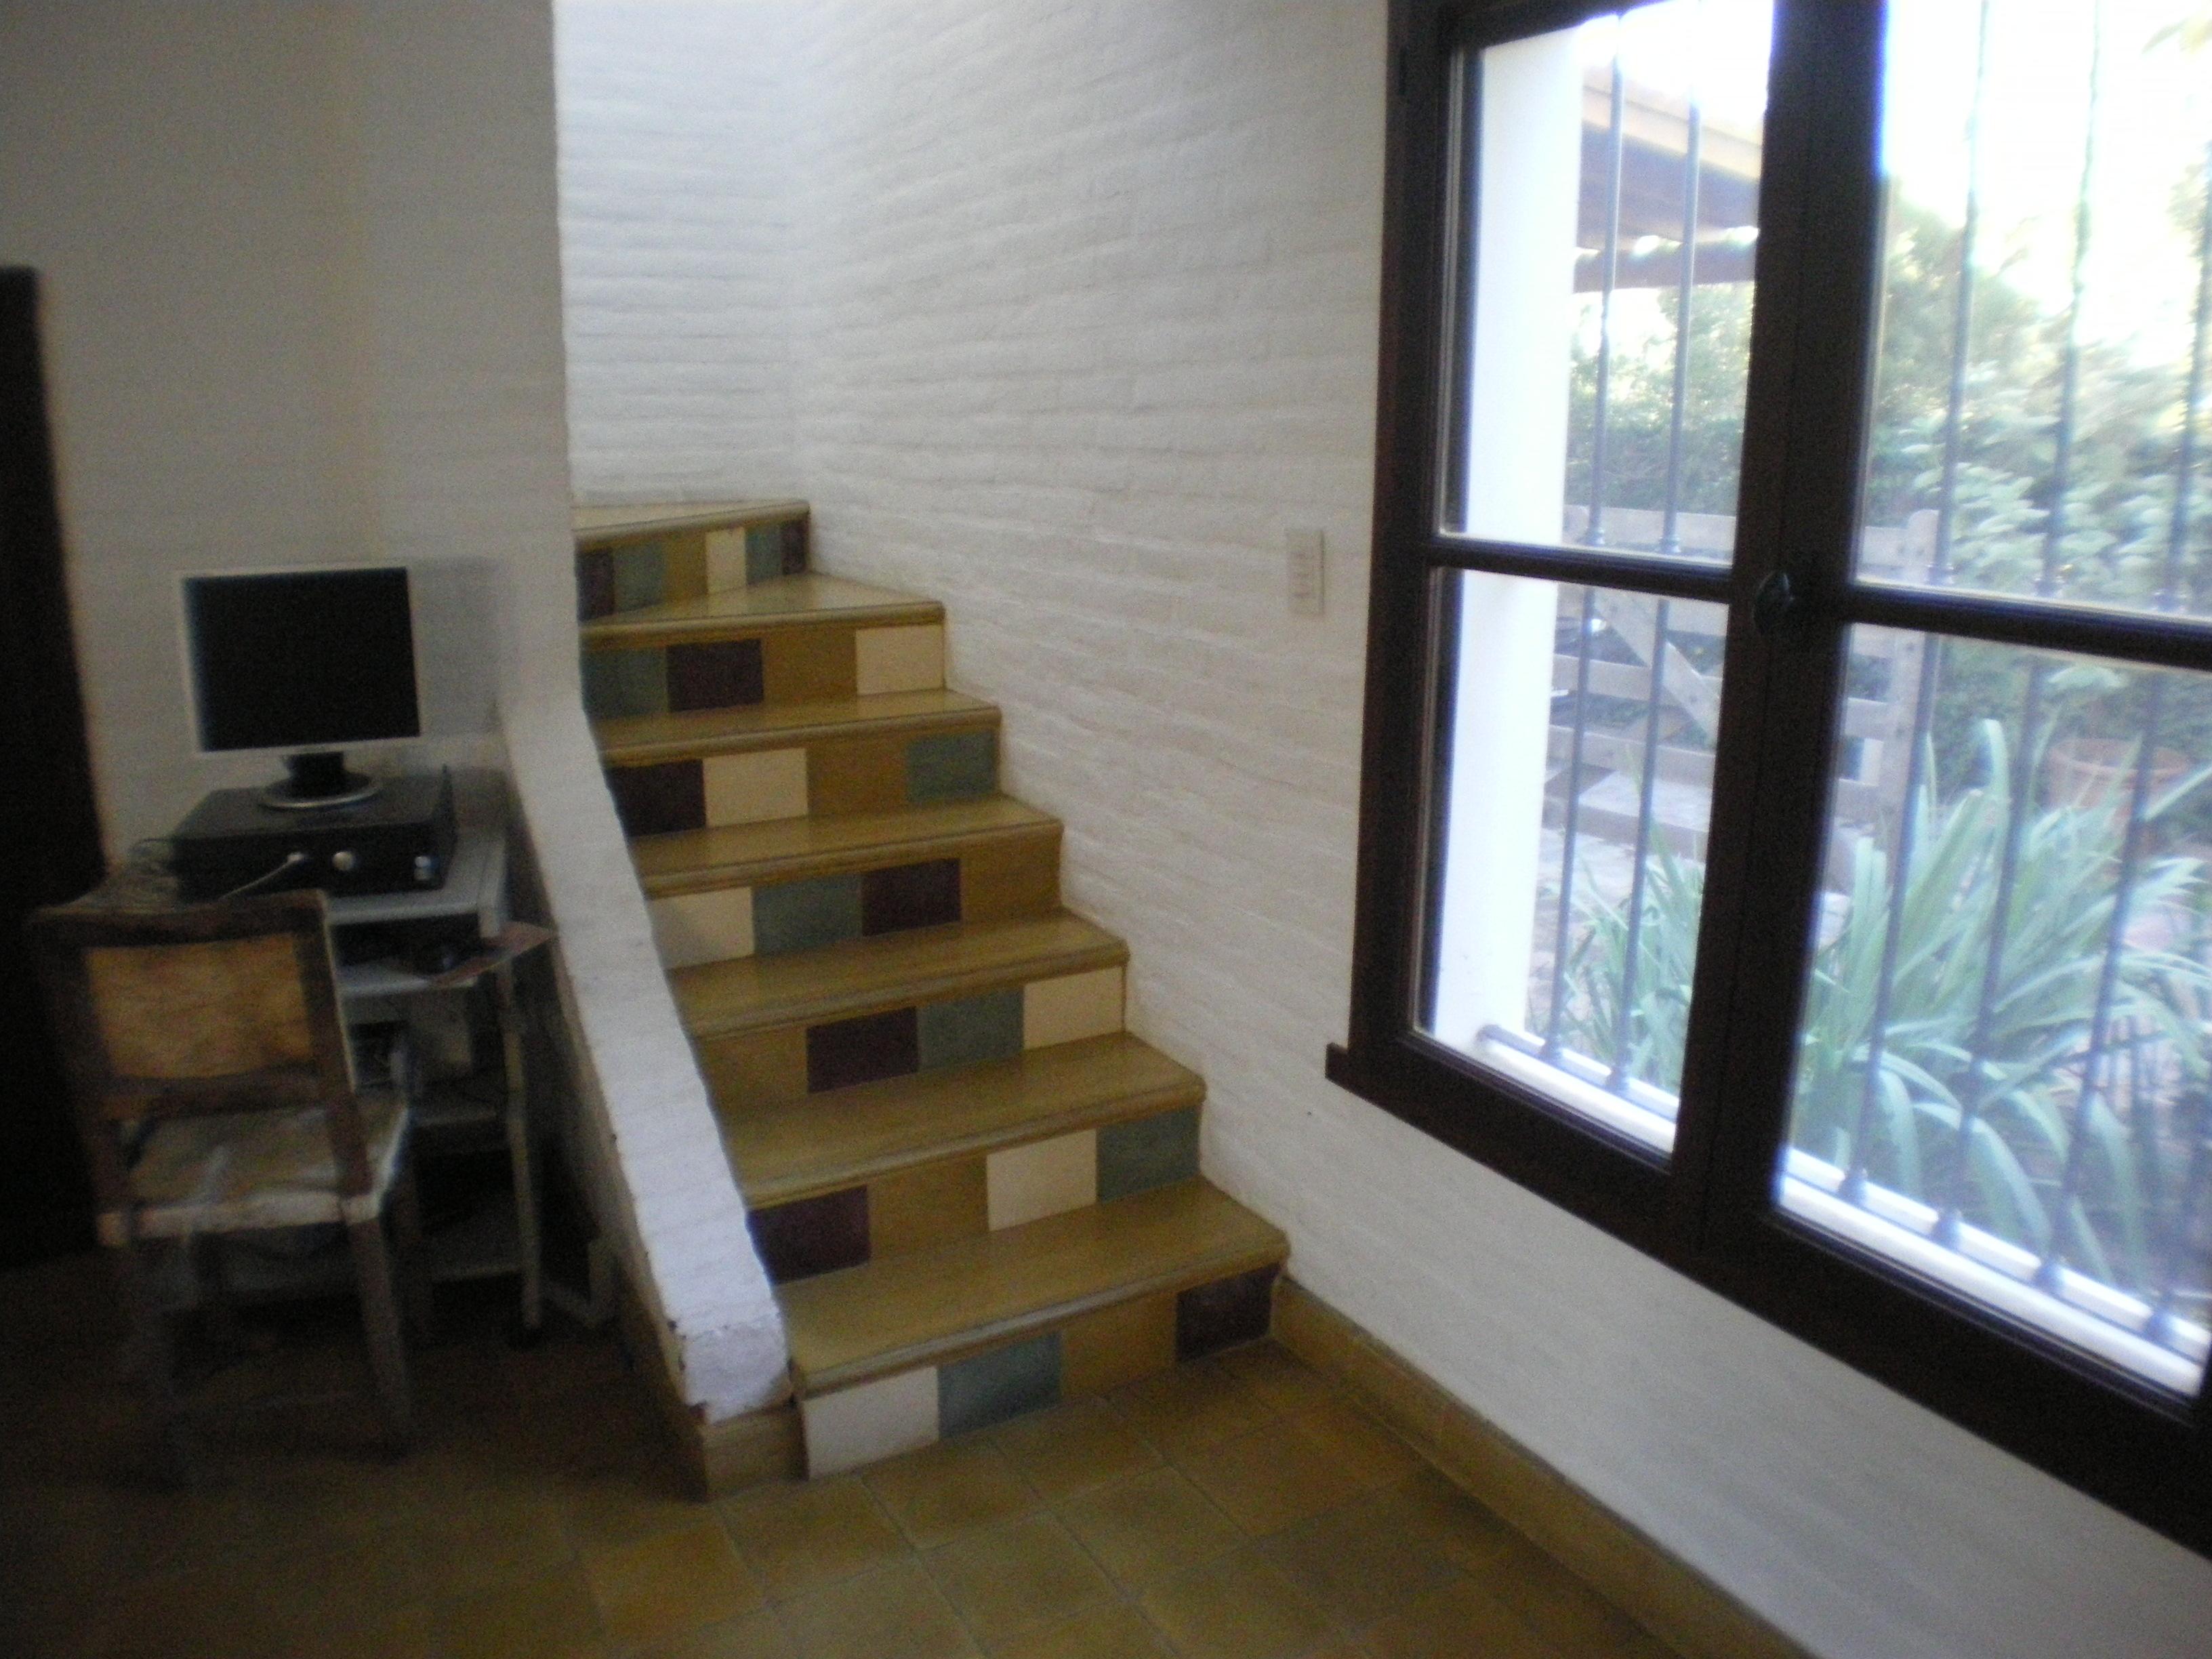 Escalera actual